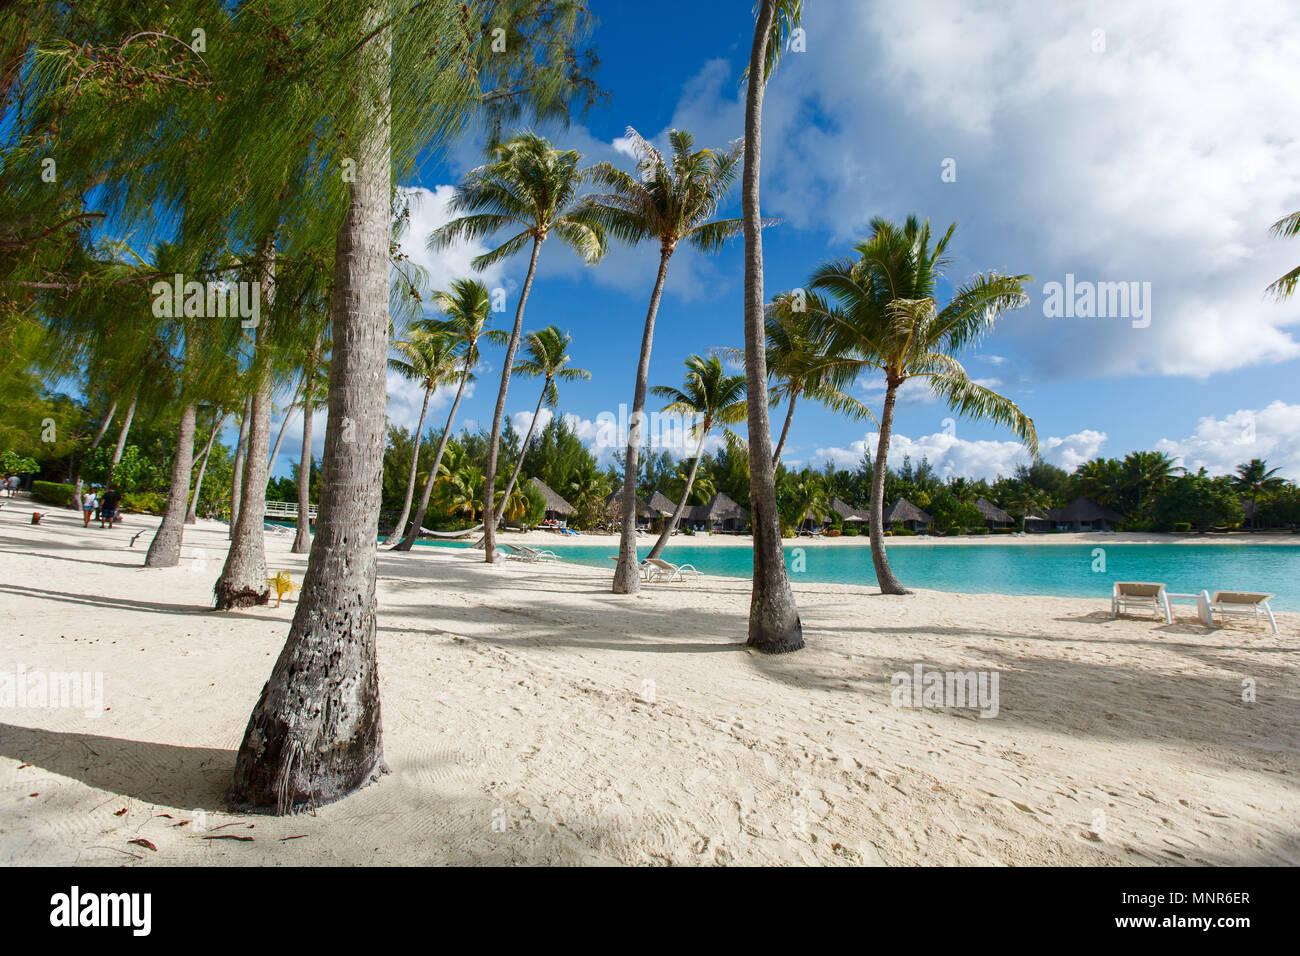 Beautiful beach with coconut palms on Bora Bora island in French Polynesia - Stock Image